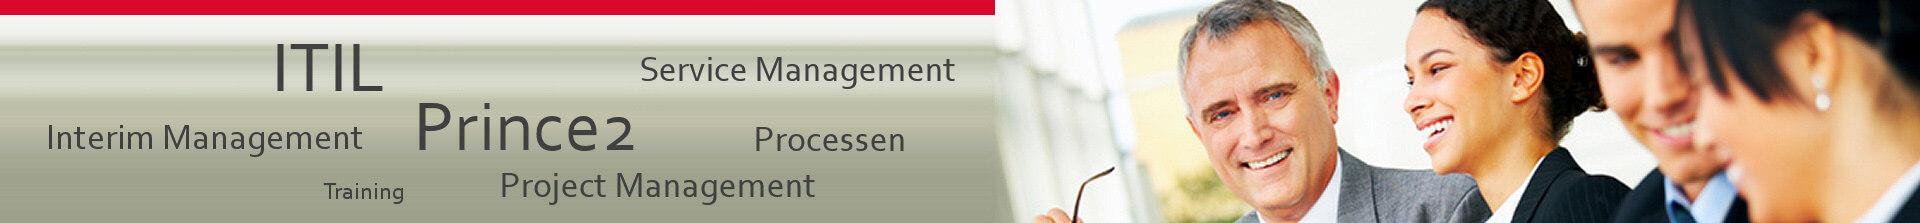 Gertjan de Graaf - Service & Project  Management Professional